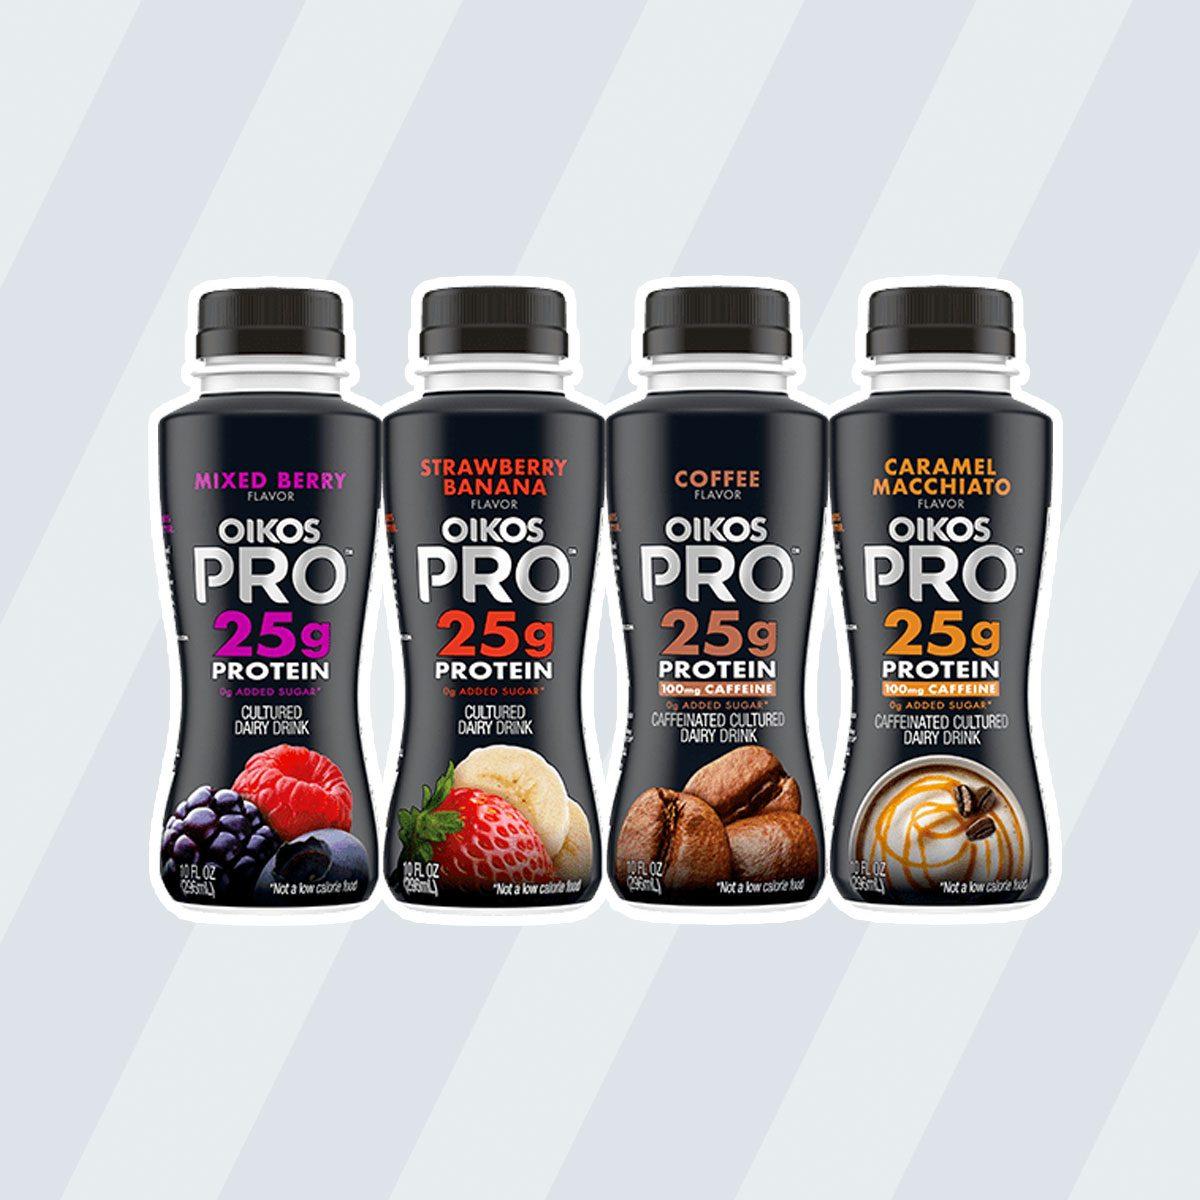 Oikos Pro Fuel healthy snacks to buy